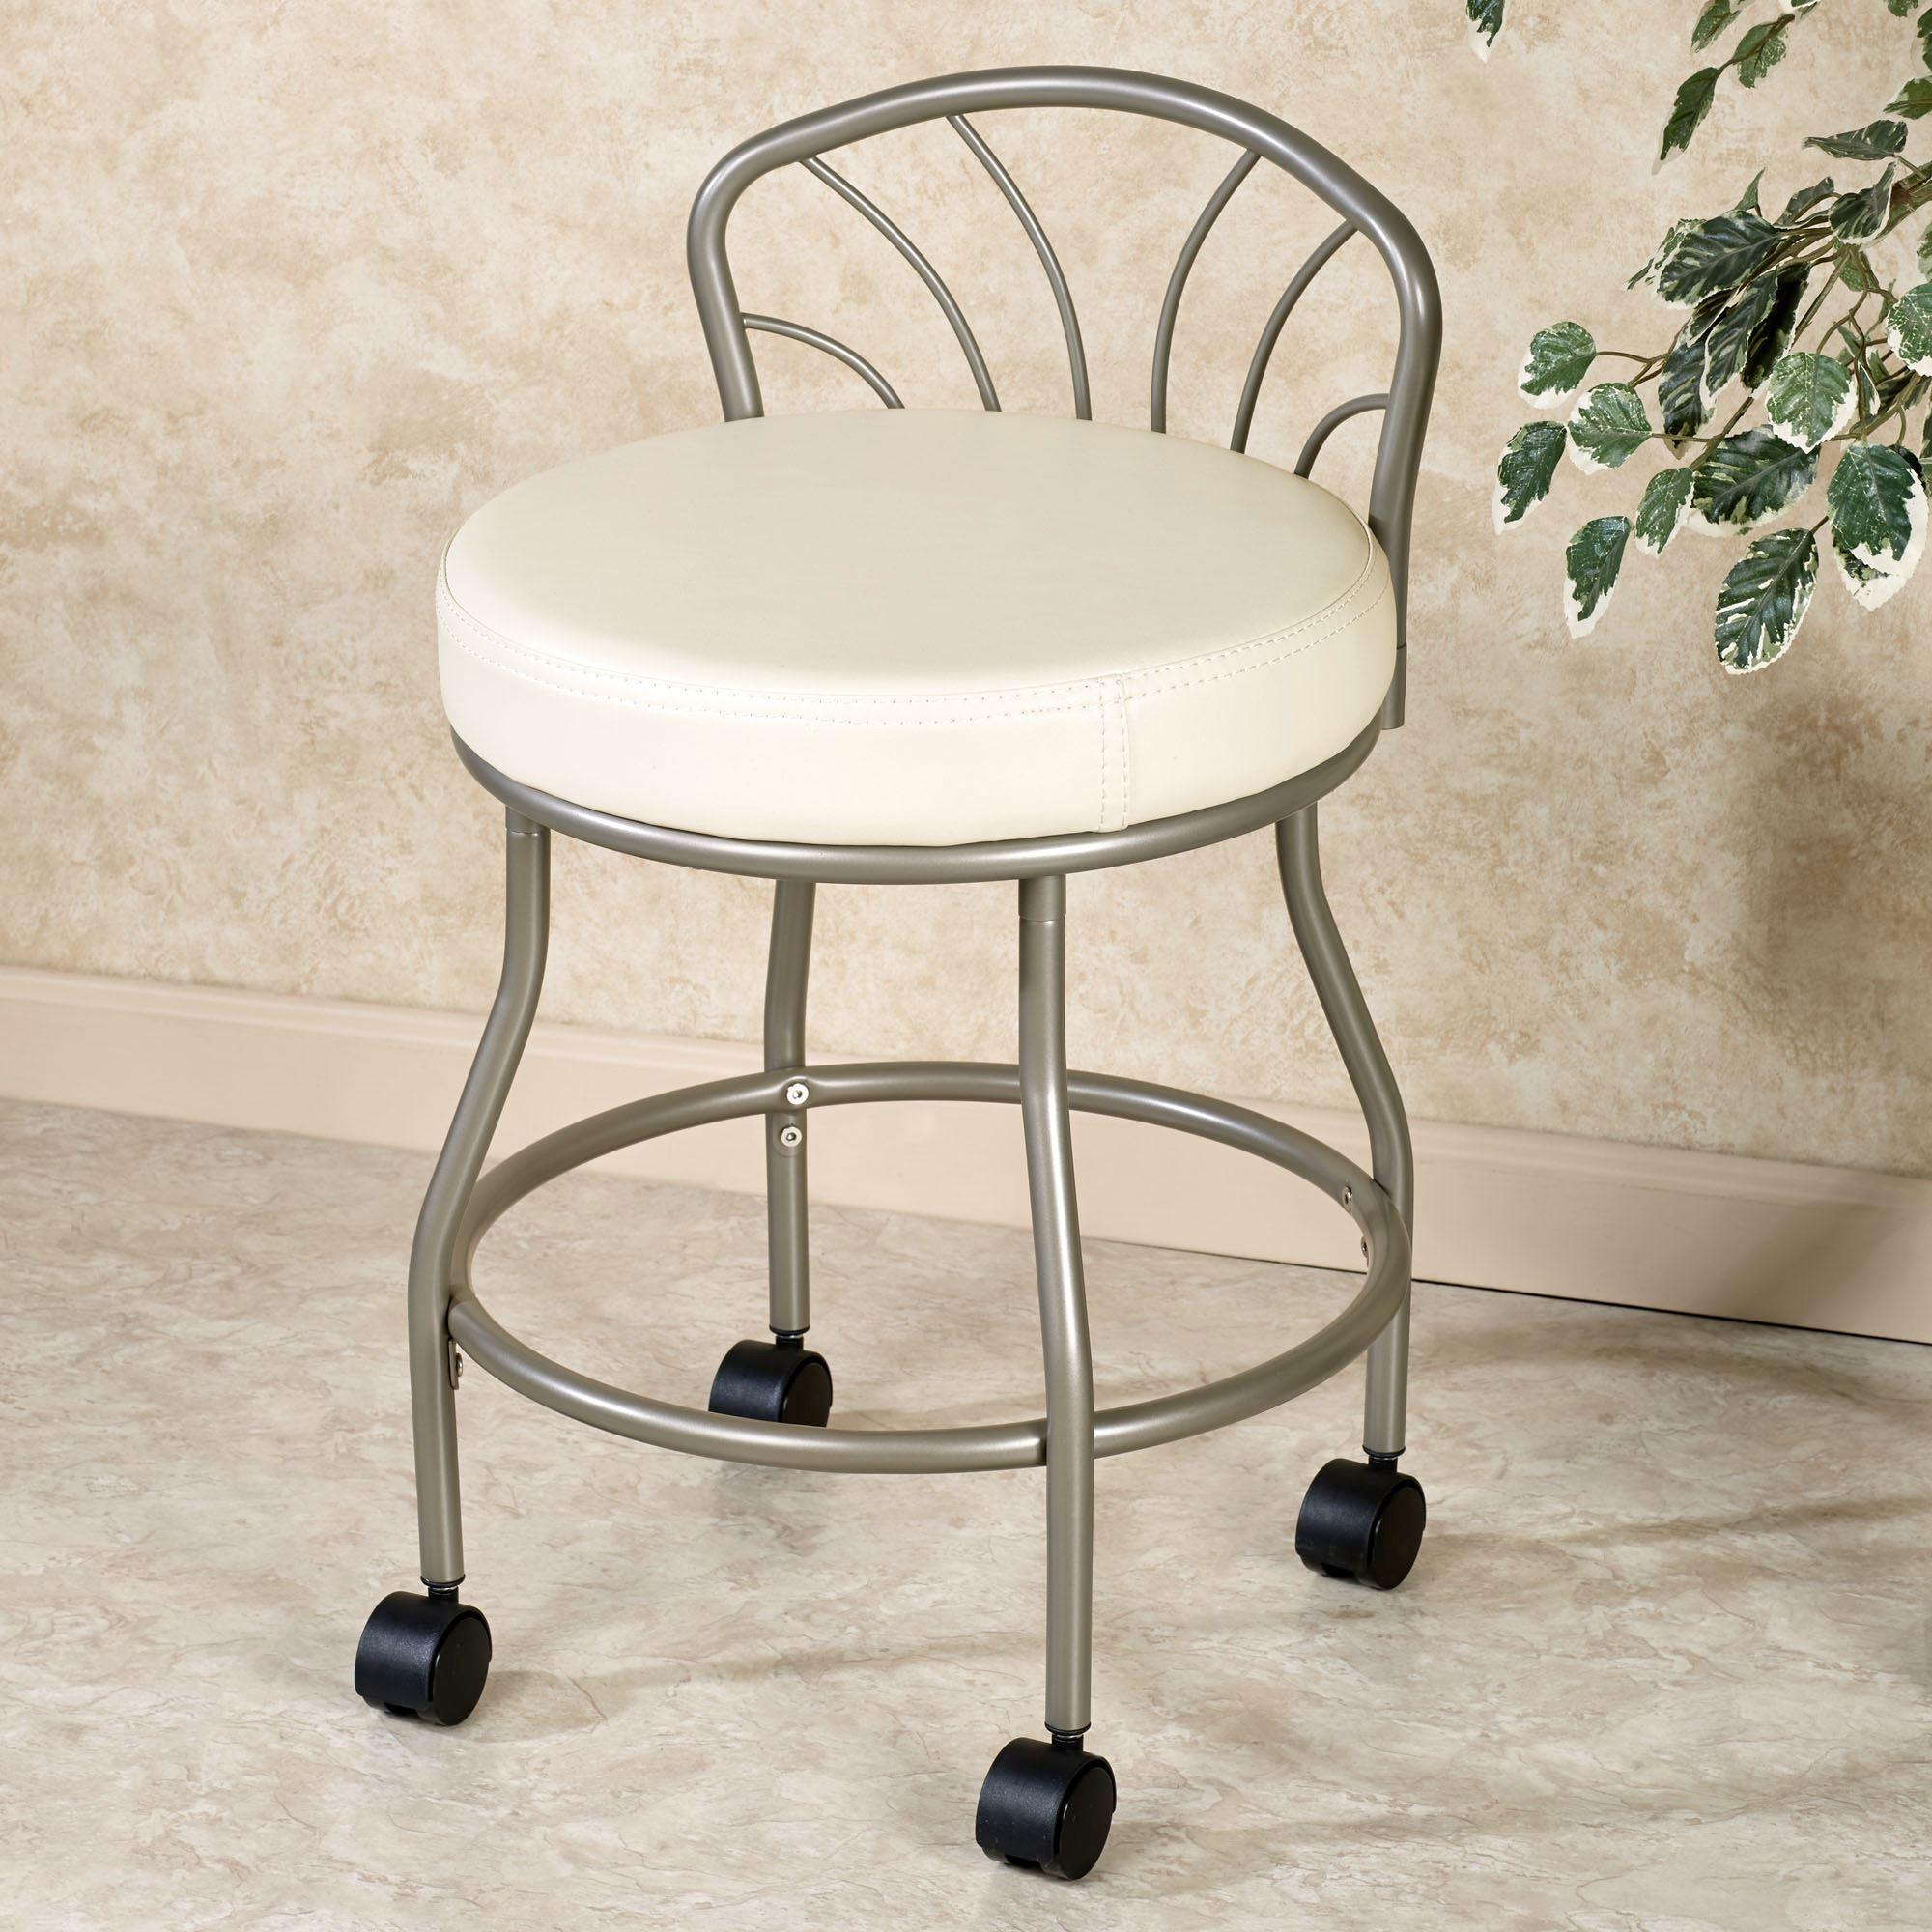 flare back powder finish vanity chair. click to expand TXIQTCV